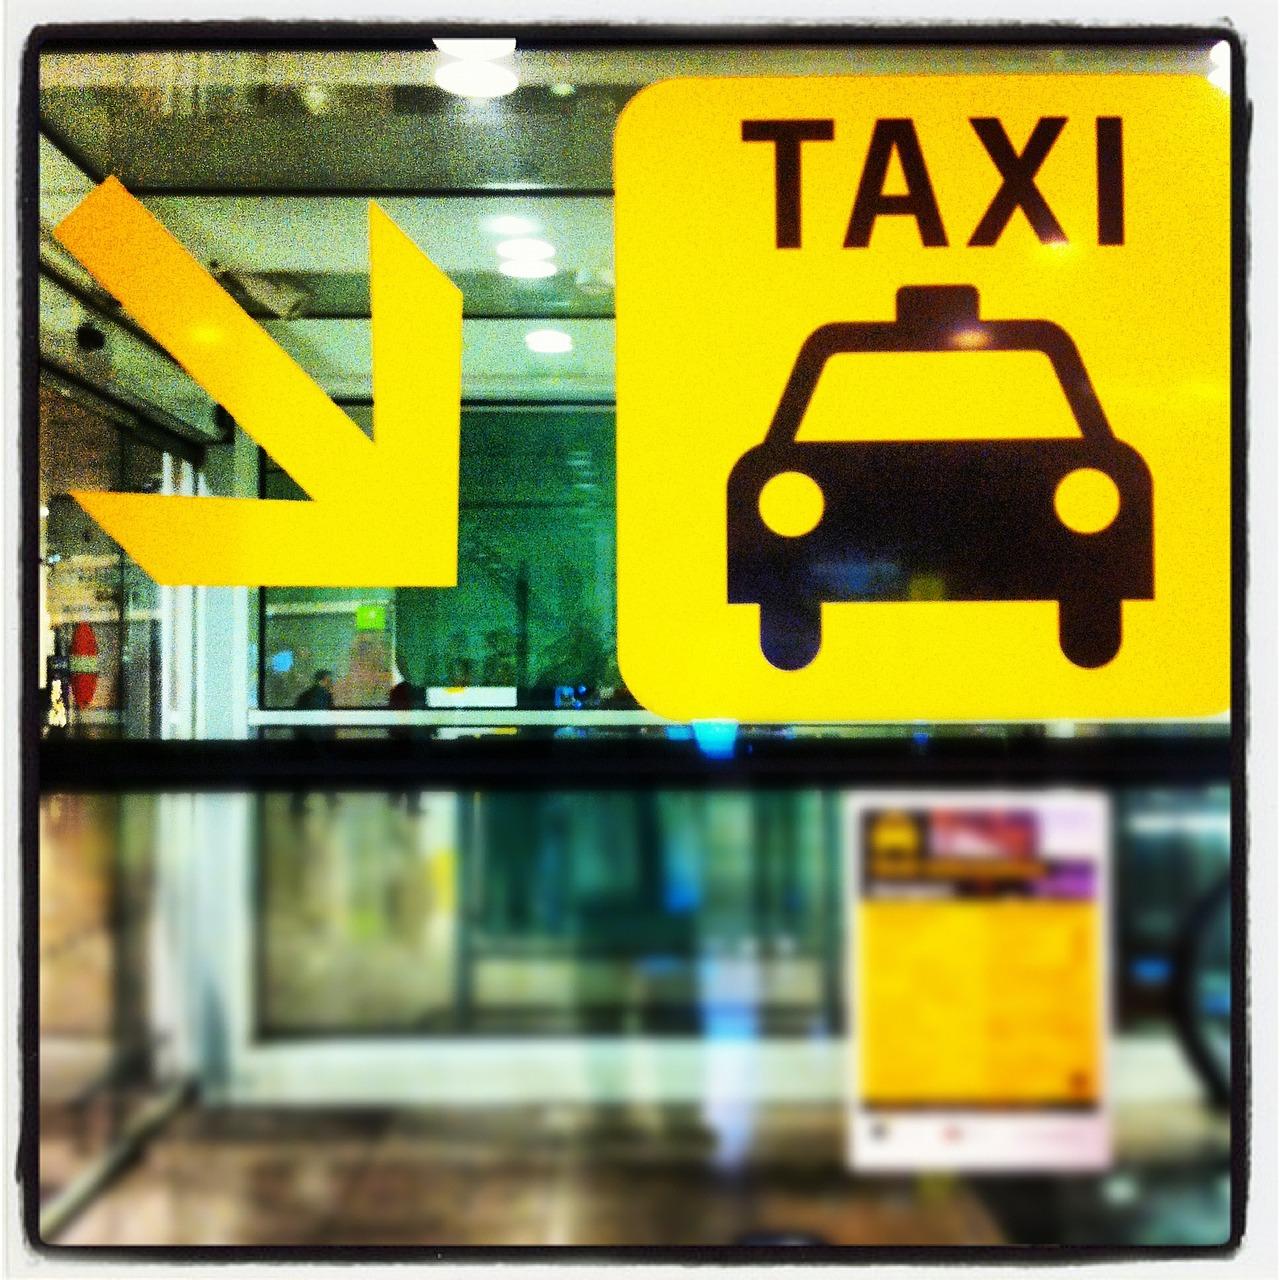 barcelona-413206_1280 Taxi